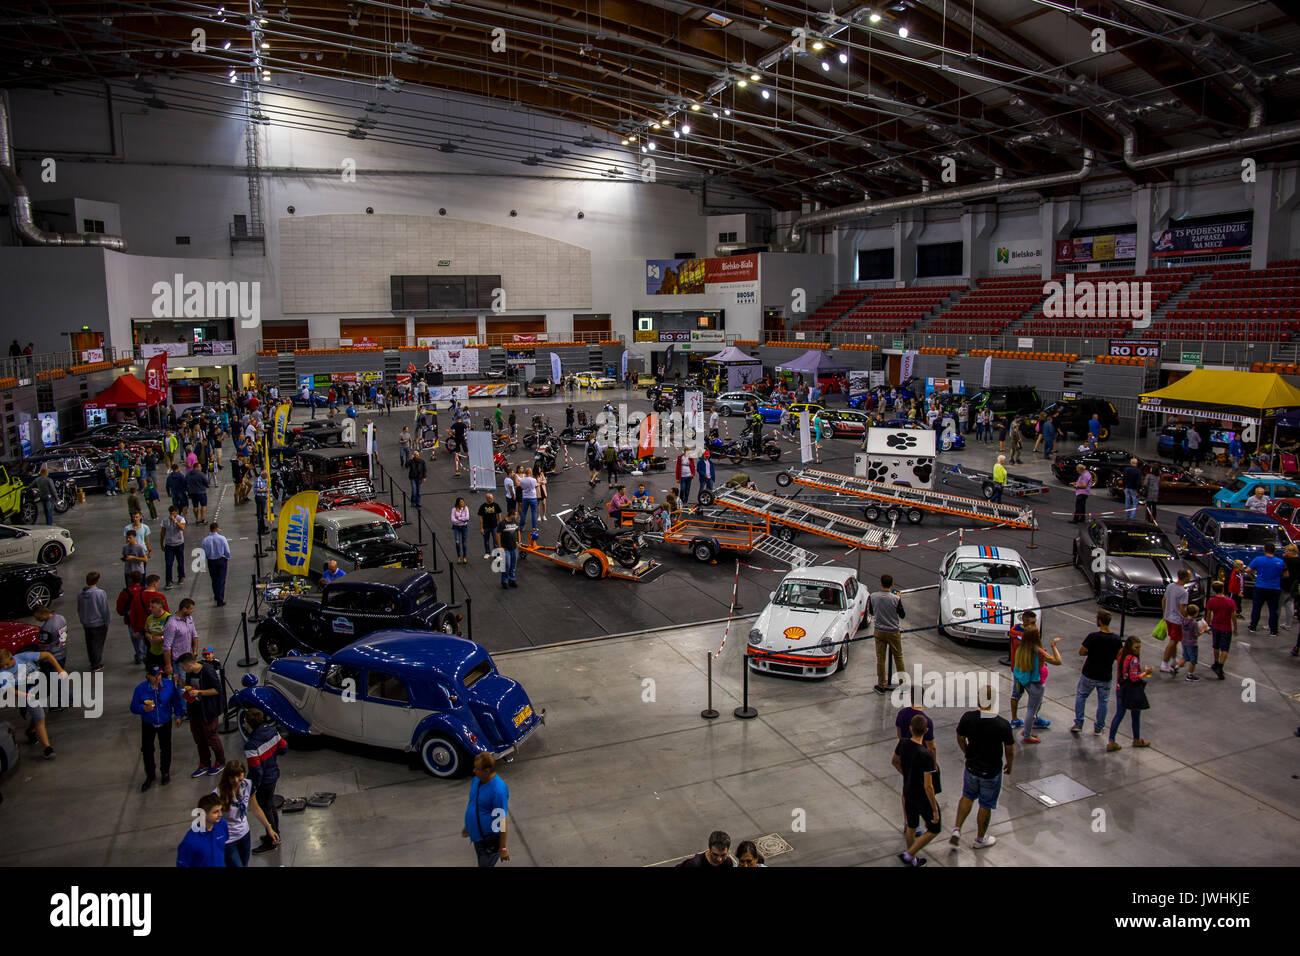 Bielsko-Biala, Poland. 12th Aug, 2017. International automotive trade fairs - MotoShow Bielsko-Biala. Main hall. Credit: Lukasz Obermann/Alamy Live News - Stock Image